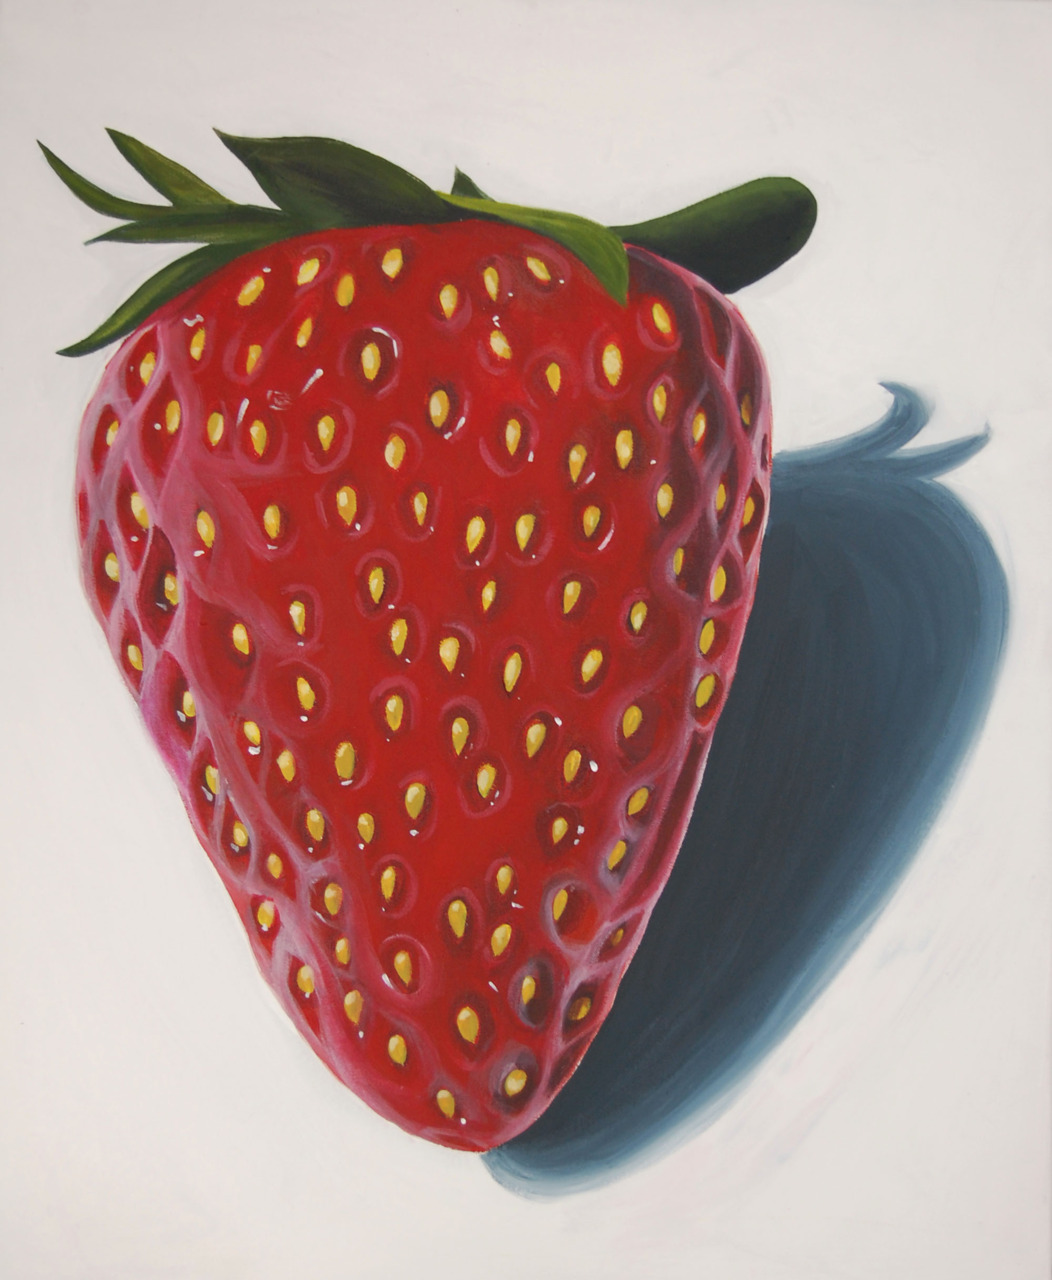 Strawberry   2011. Acrylic on canvas. 24 x 30.